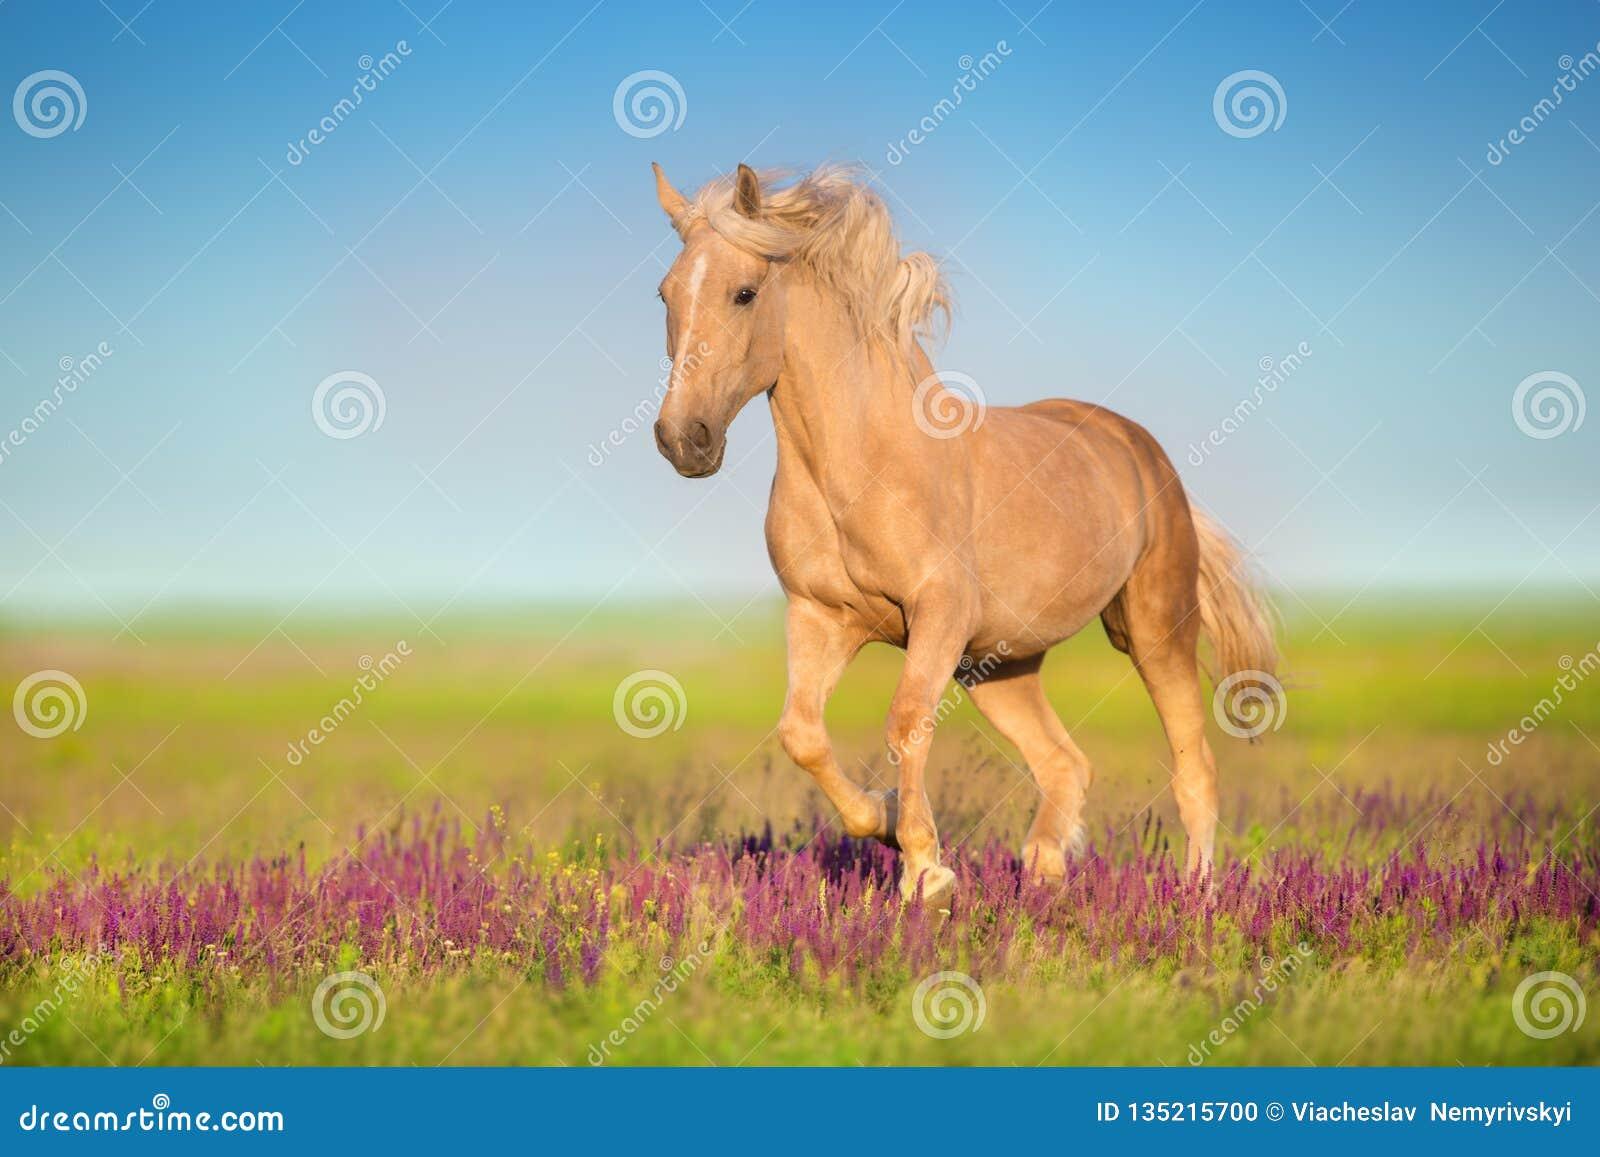 Cremello koń w kwiatach